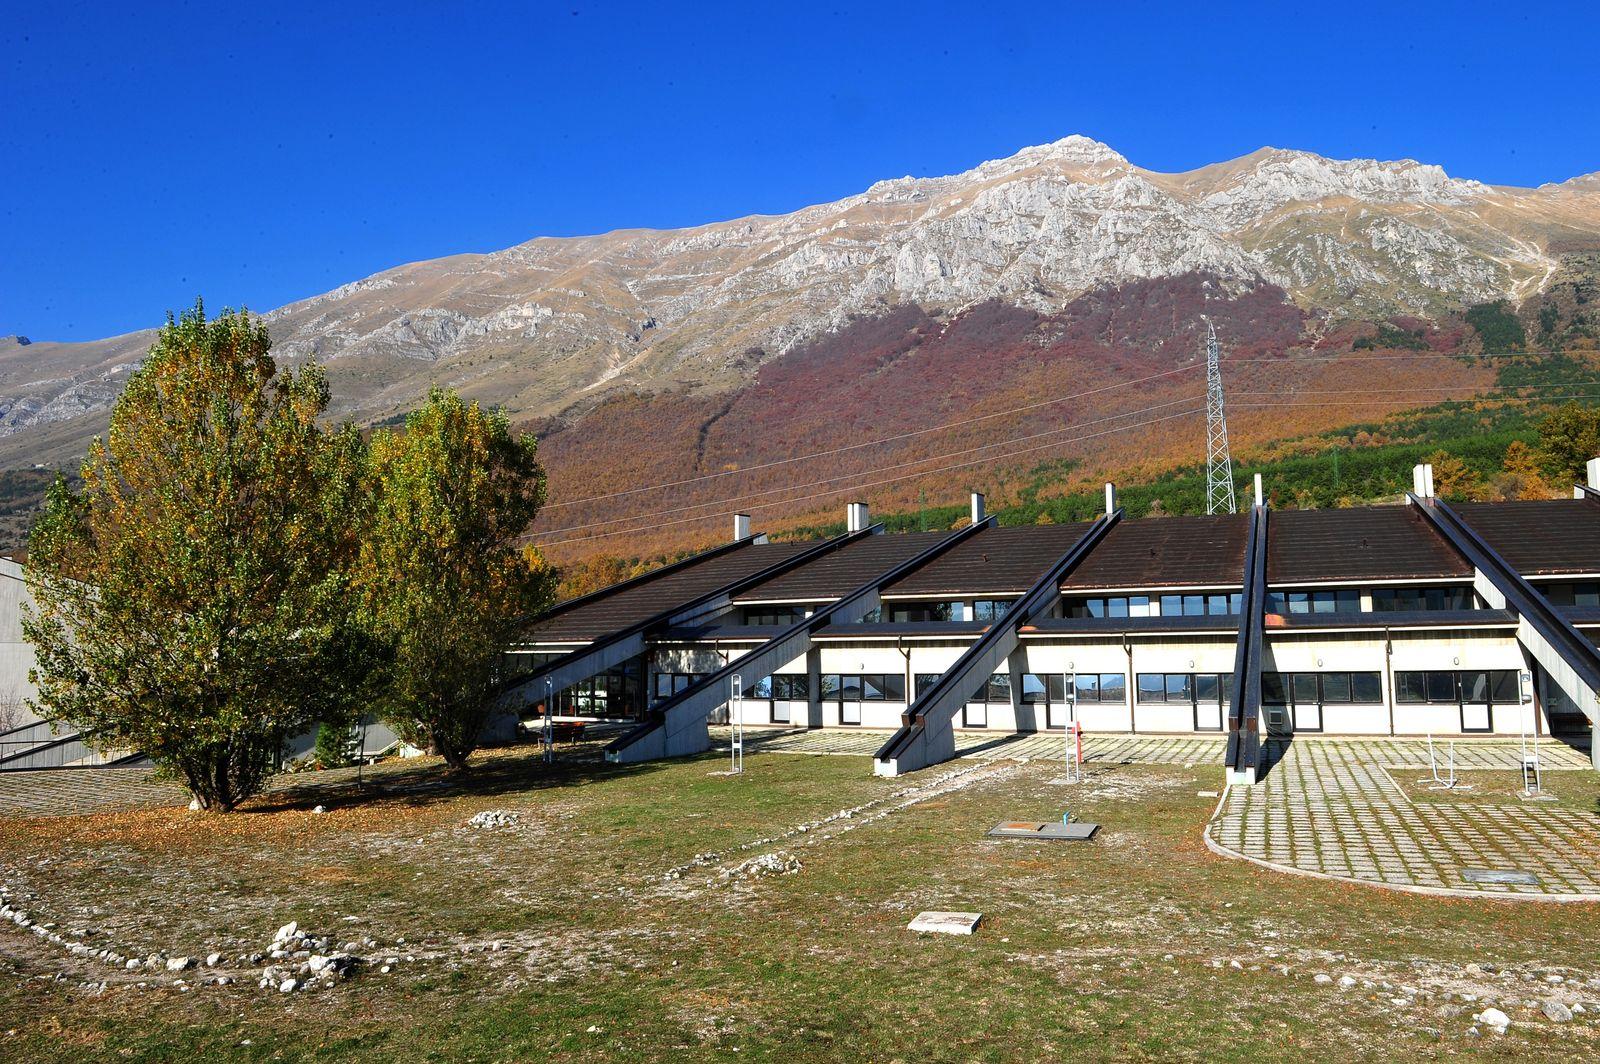 Gran Sasso National Laboratory